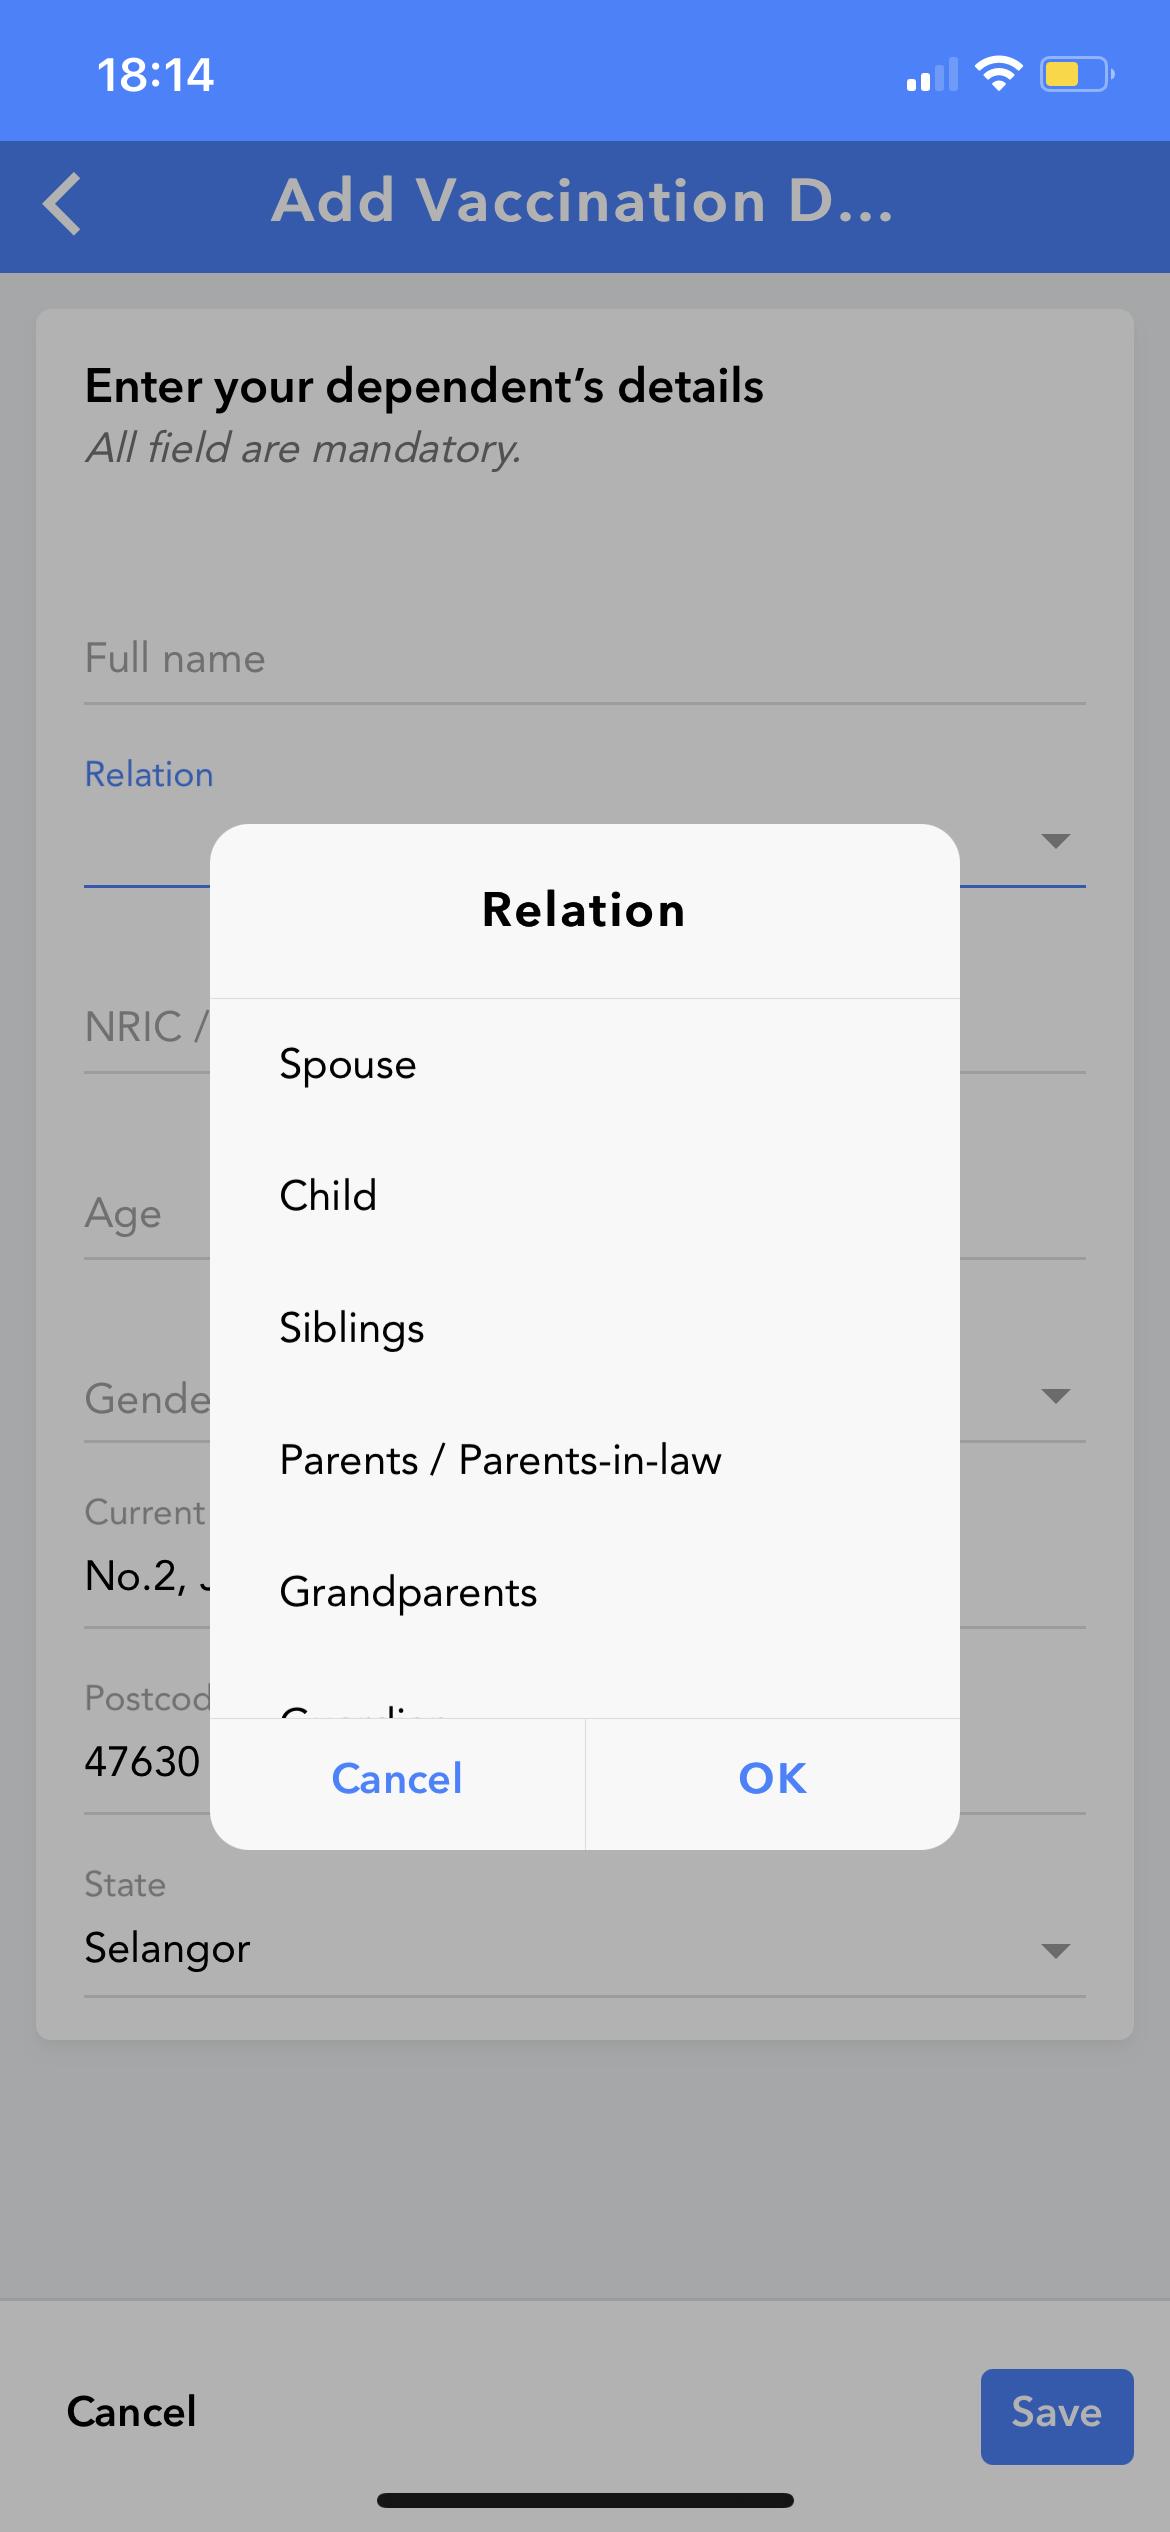 Register them today, parents!